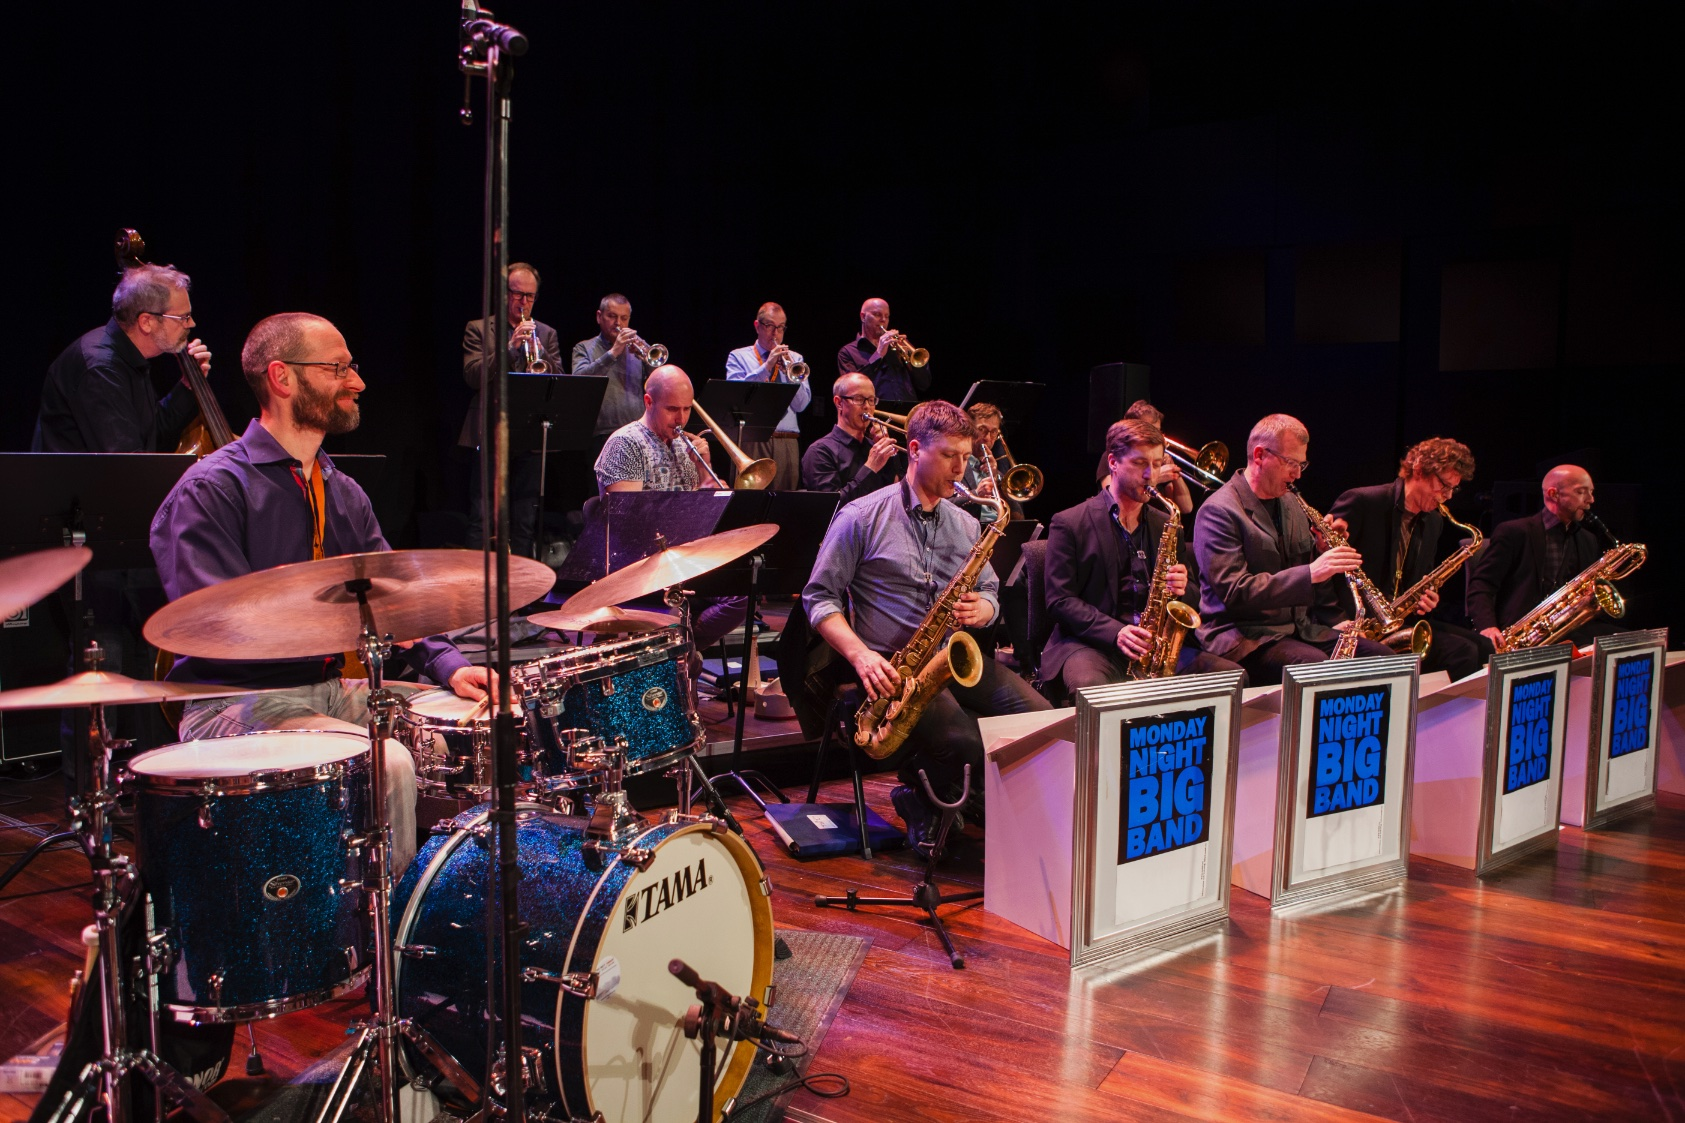 Monday night big band with viktoria tolstoy - solhällan